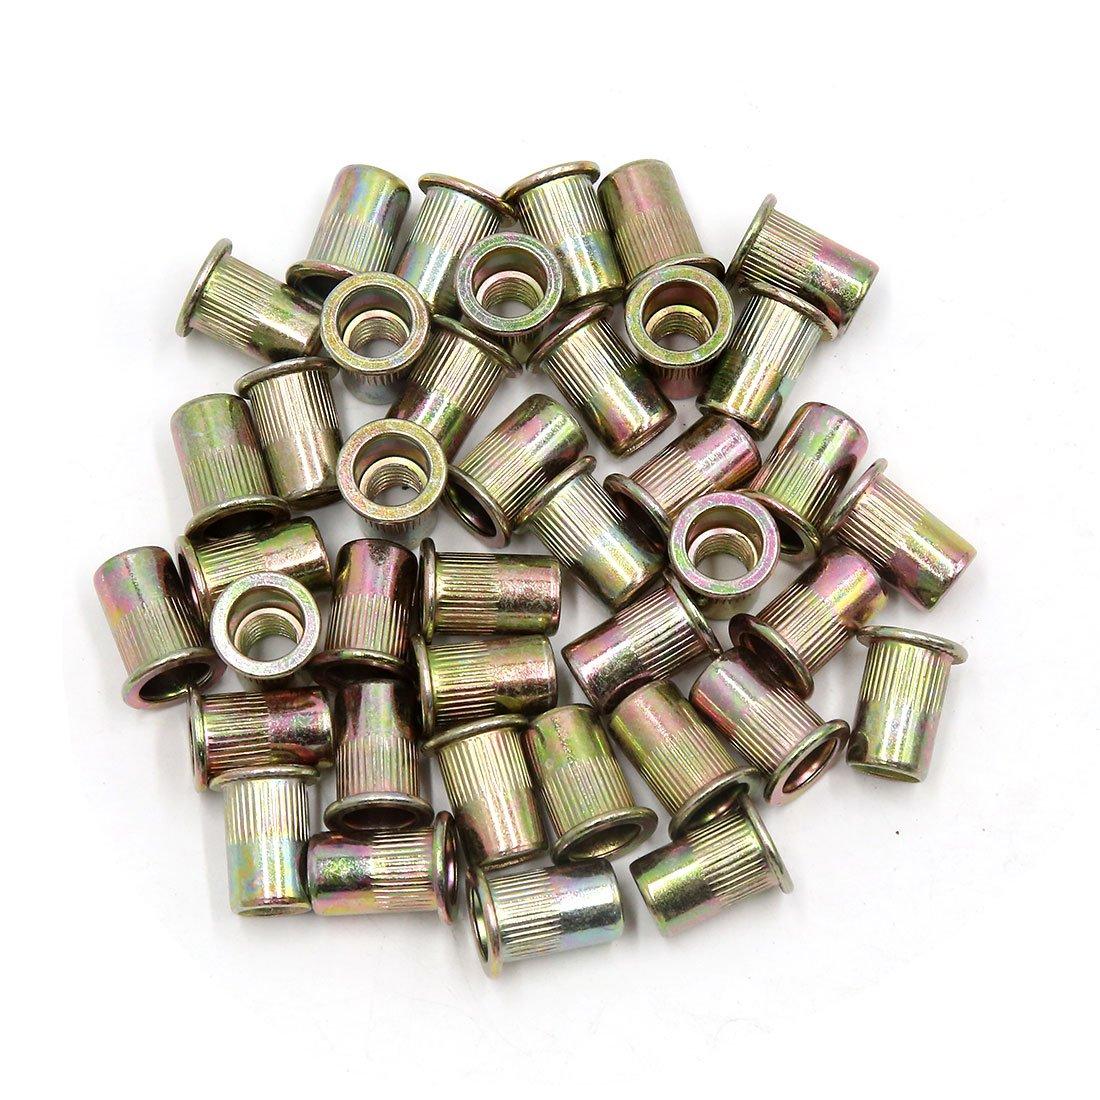 uxcell/® 150 Pcs 5//16-18 Bronze Tone Thread Rivet Nut Insert Nutserts for Vehicle